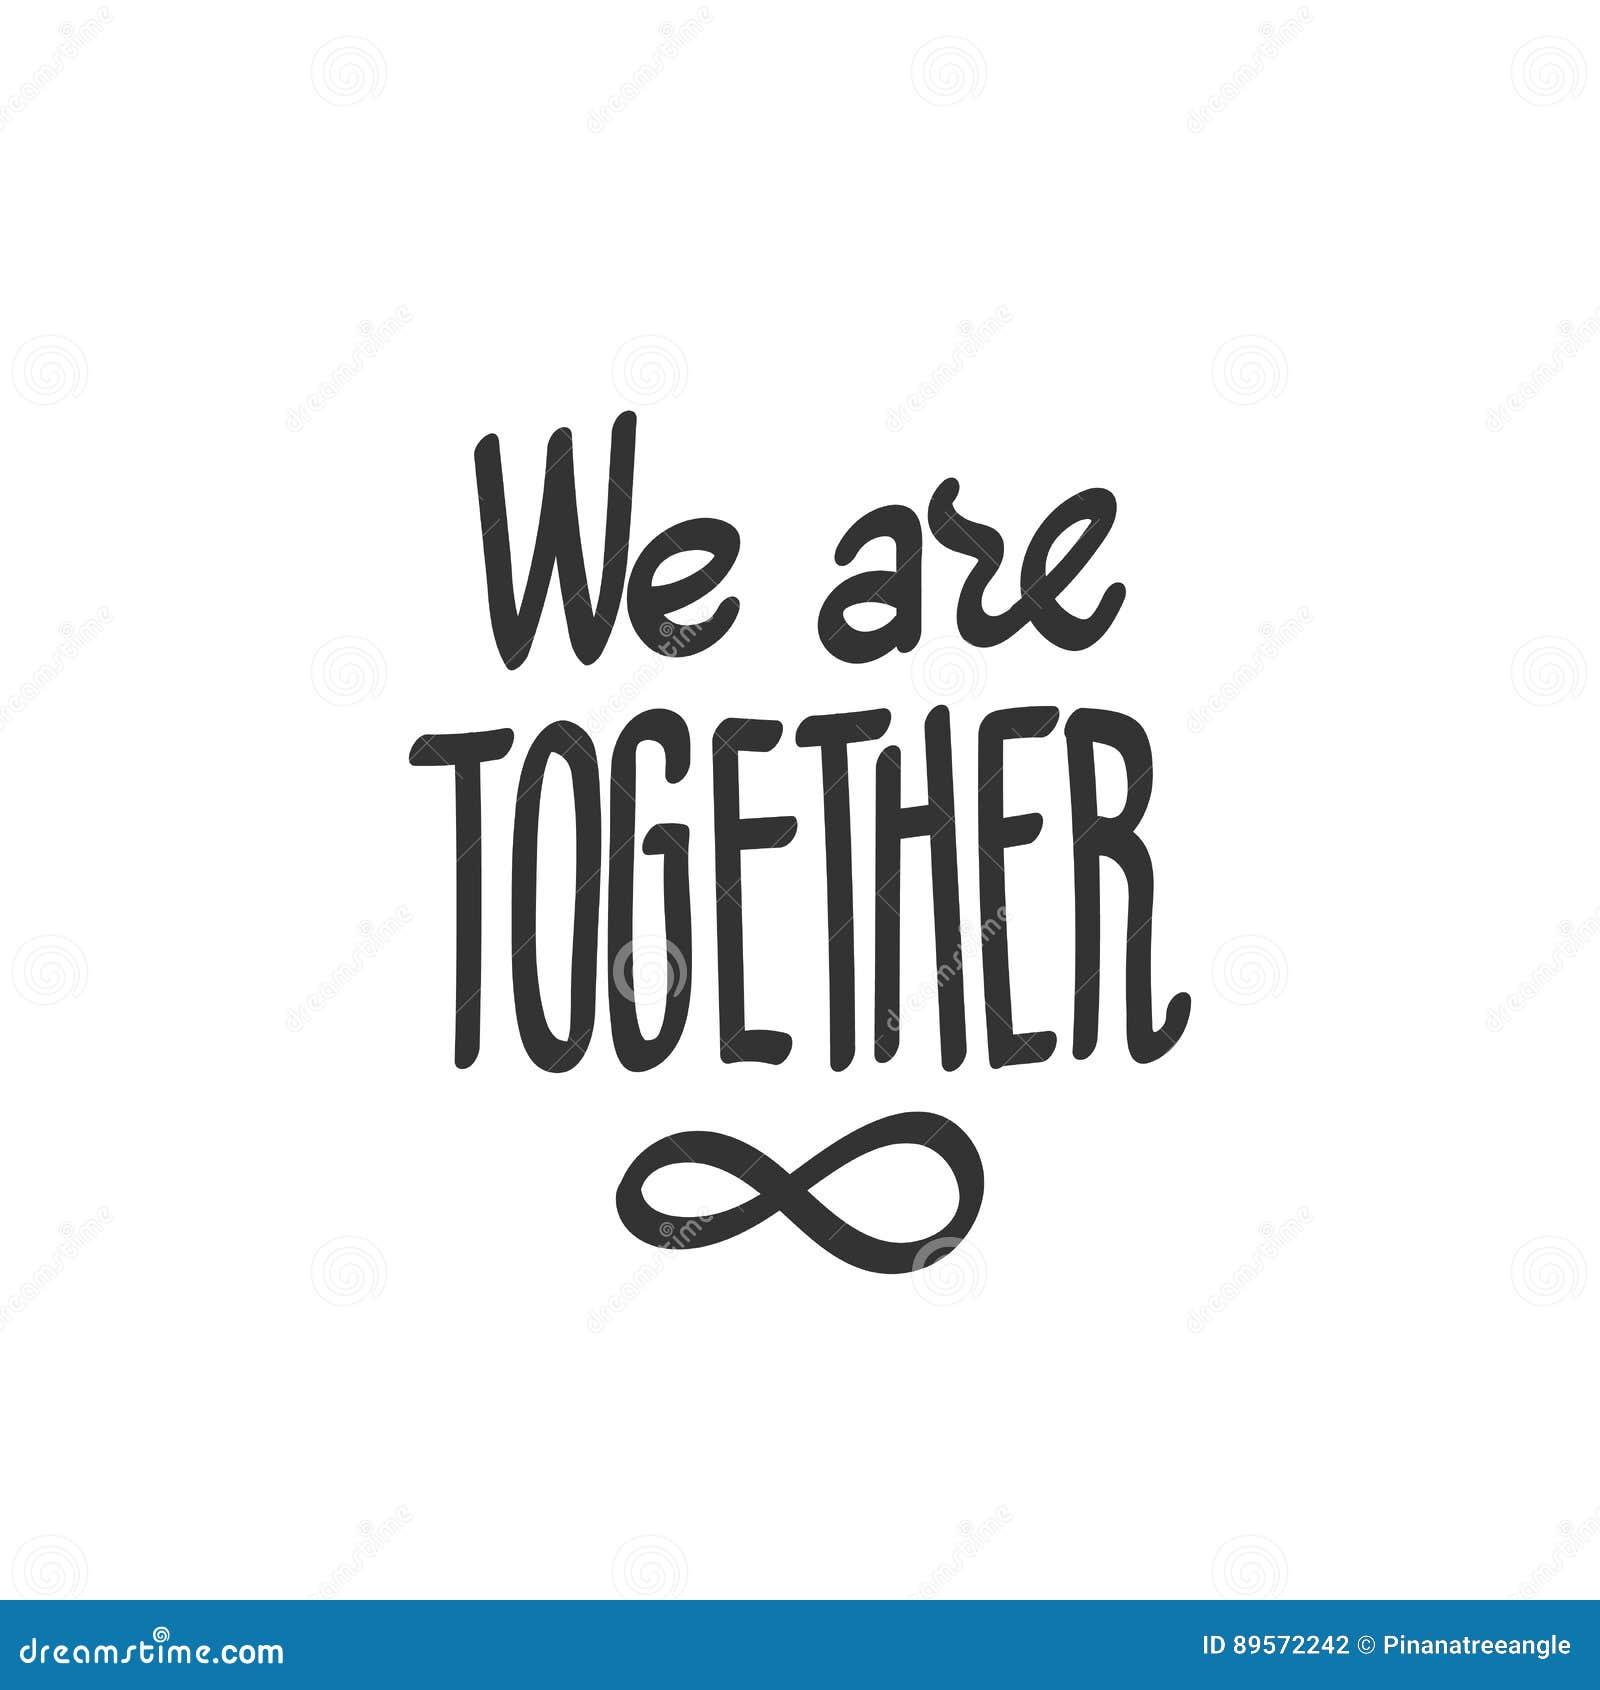 Black infinity symbol stock illustrations 2248 black infinity we are together infinity symbol we are together lettering with infinity symbol which biocorpaavc Gallery